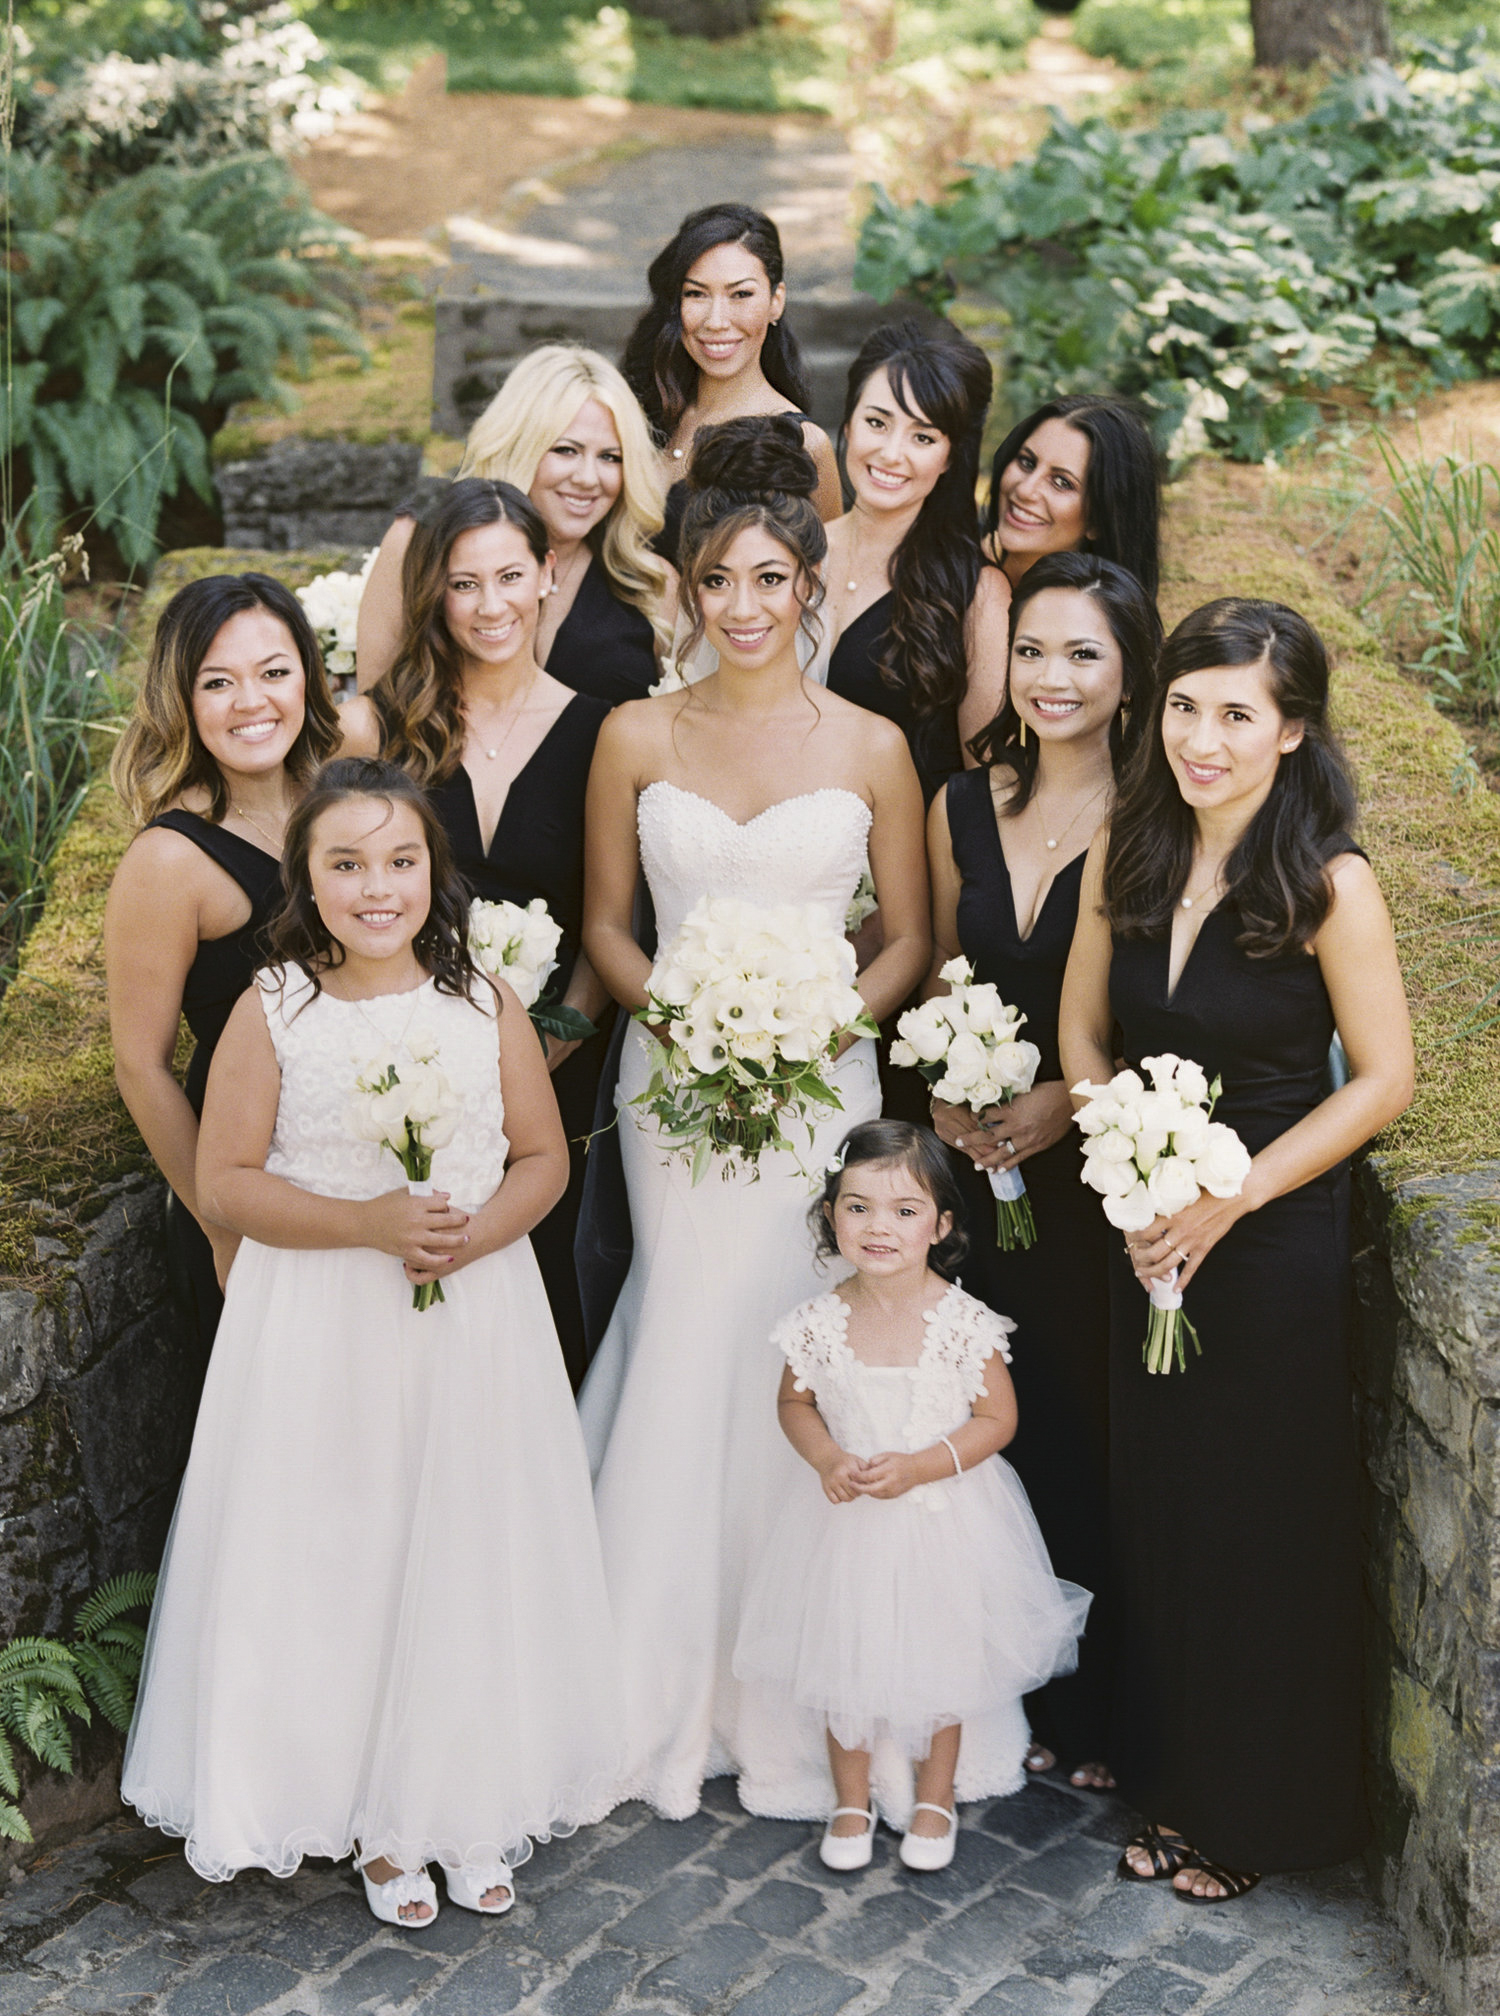 023OutliveCreative_Travel_Photographer_Videographer_Lewis&Clark_Oregon_Elegant_BlackTie_Destination_Wedding.jpg